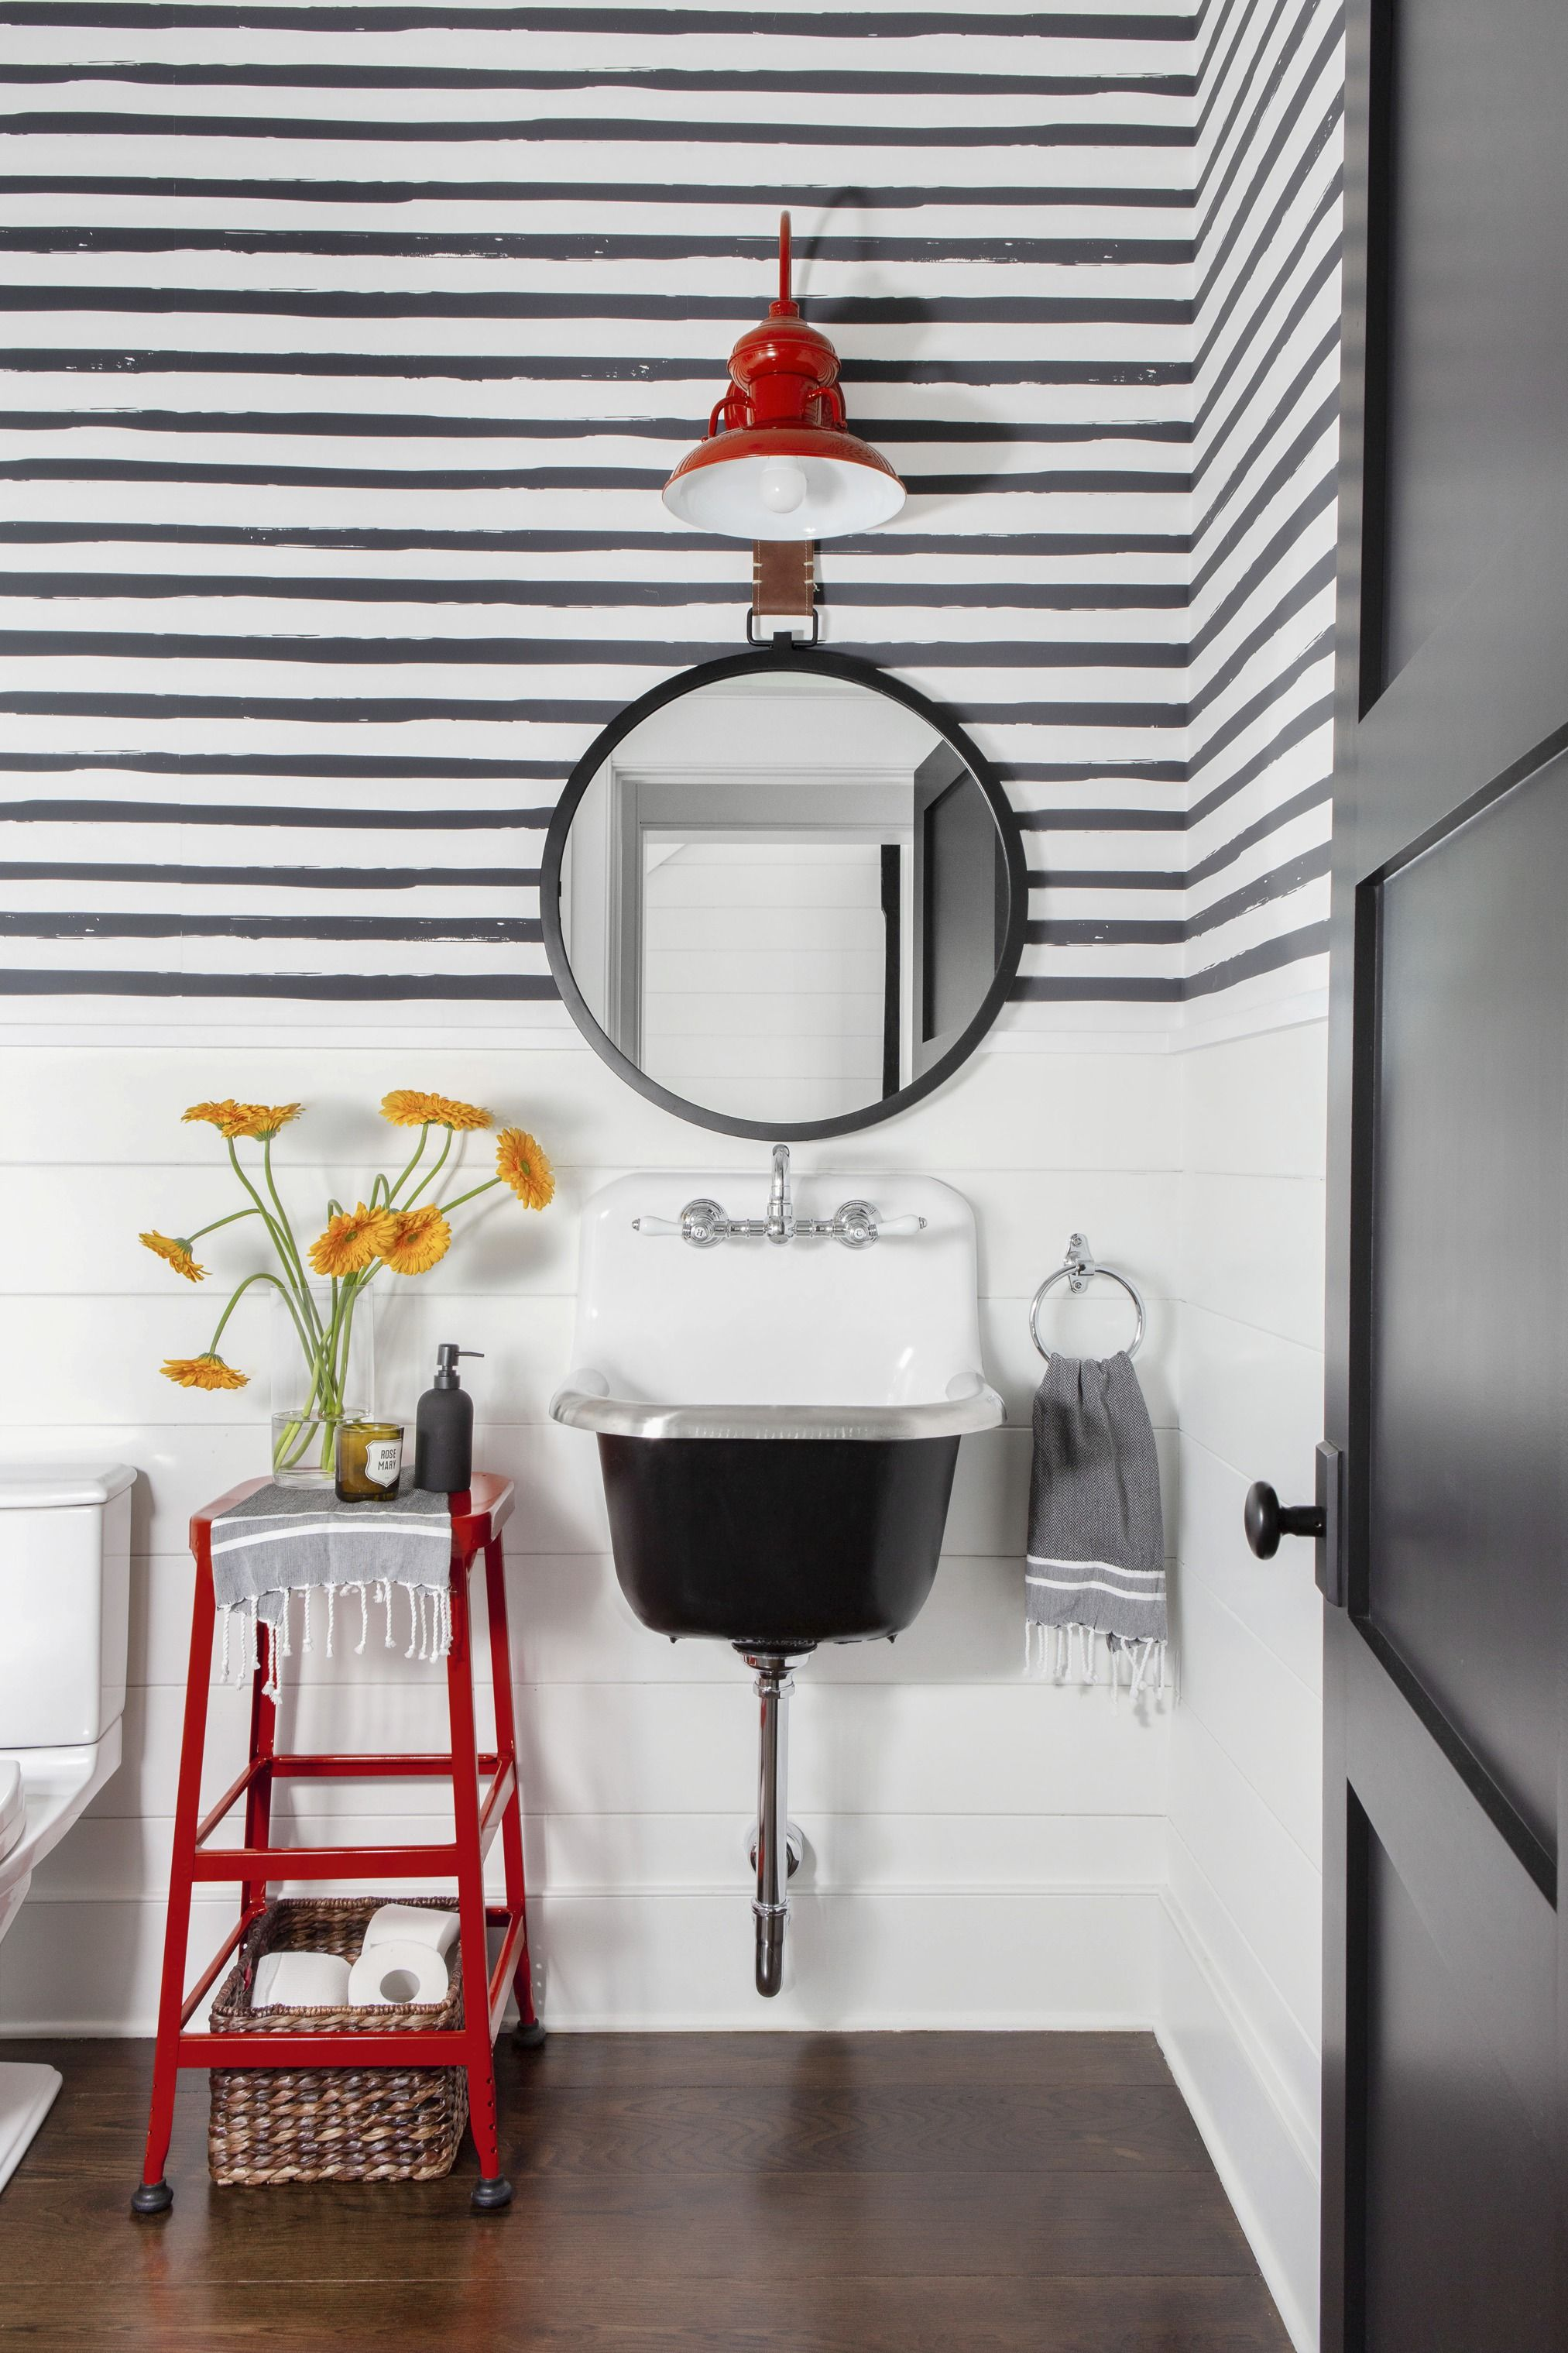 salle de bain bord de mer idee deco tendance moderne